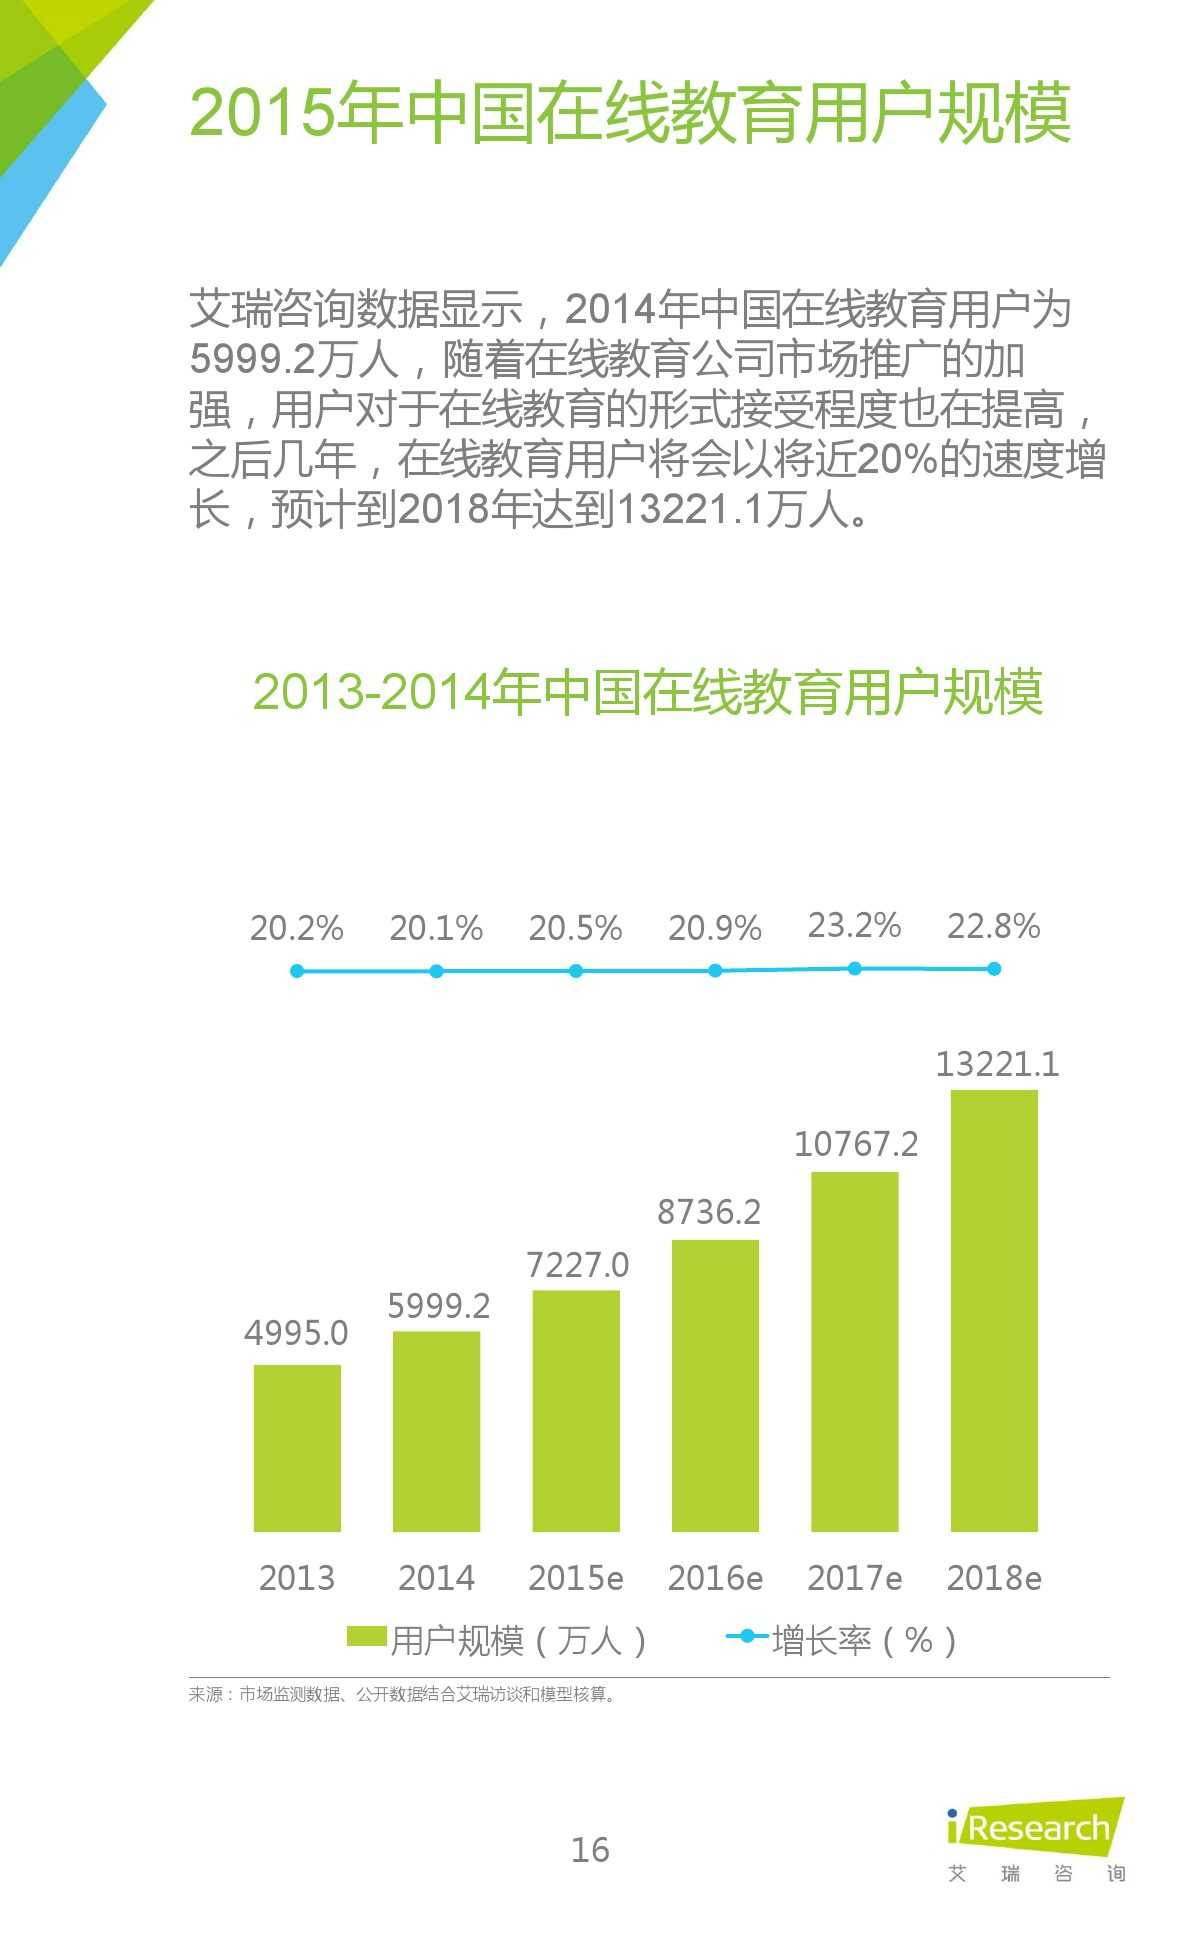 iResearch-2015年中国在线教育平台研究报告_000016